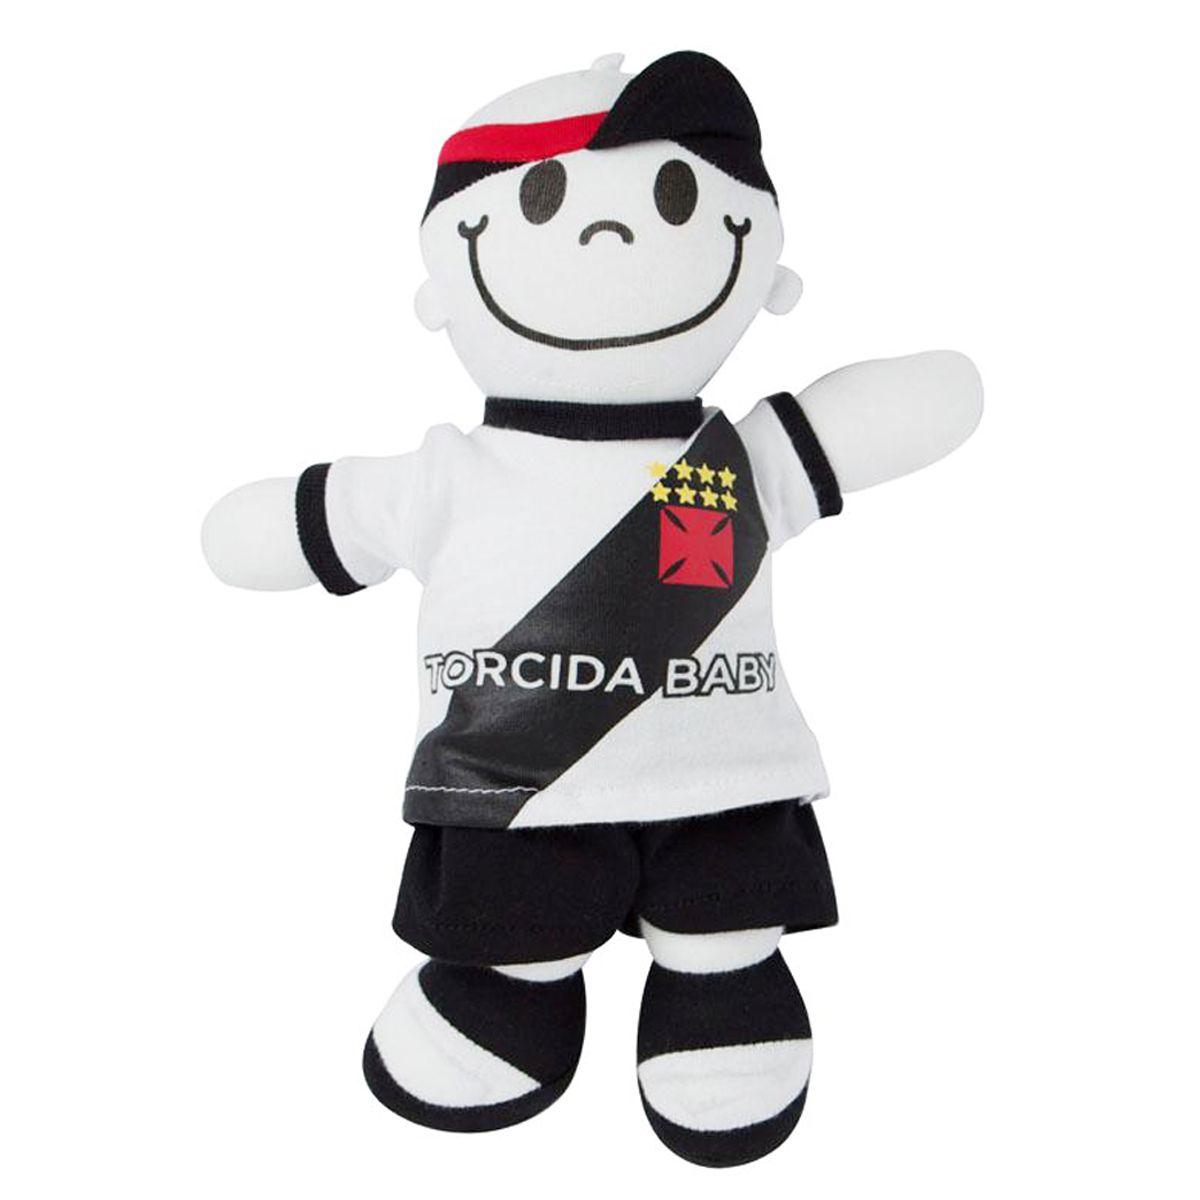 Boneco Mascote do Vasco - Torcida Baby 238A